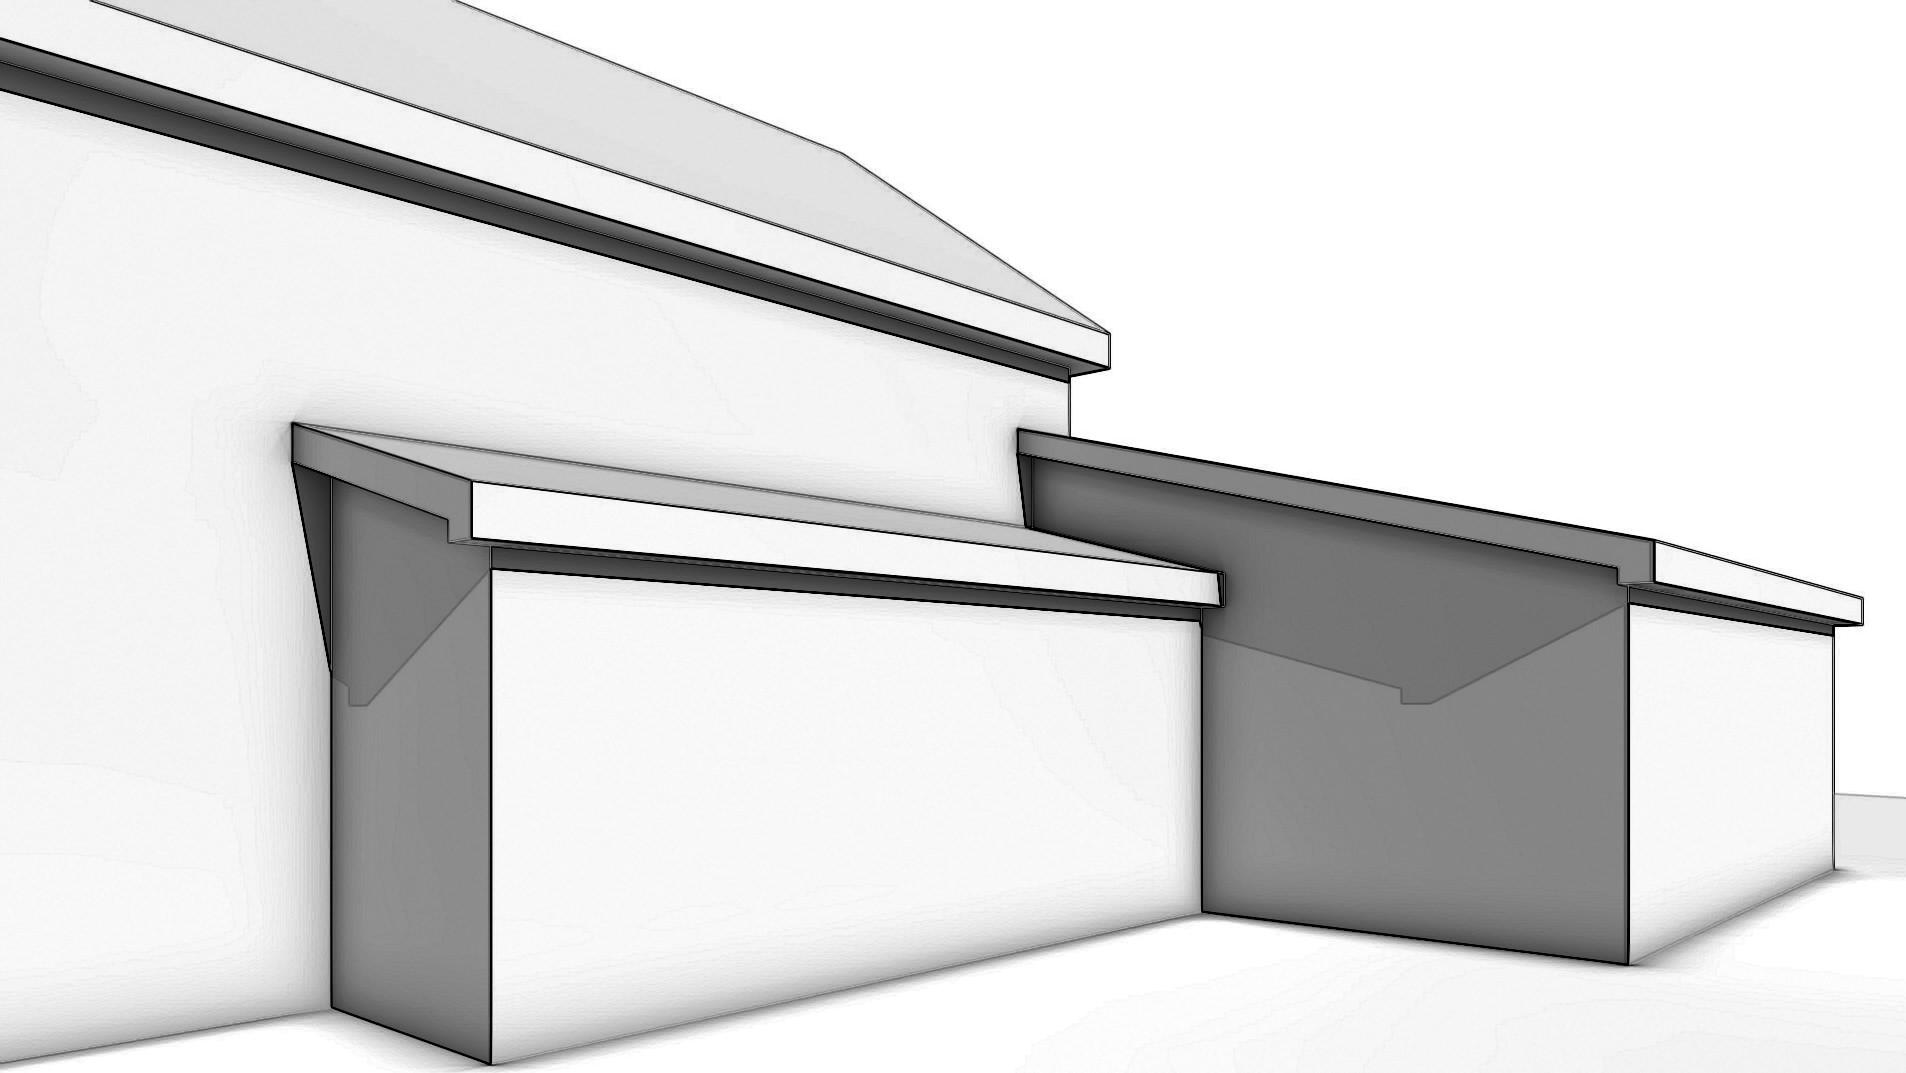 Roofline1-d.jpg